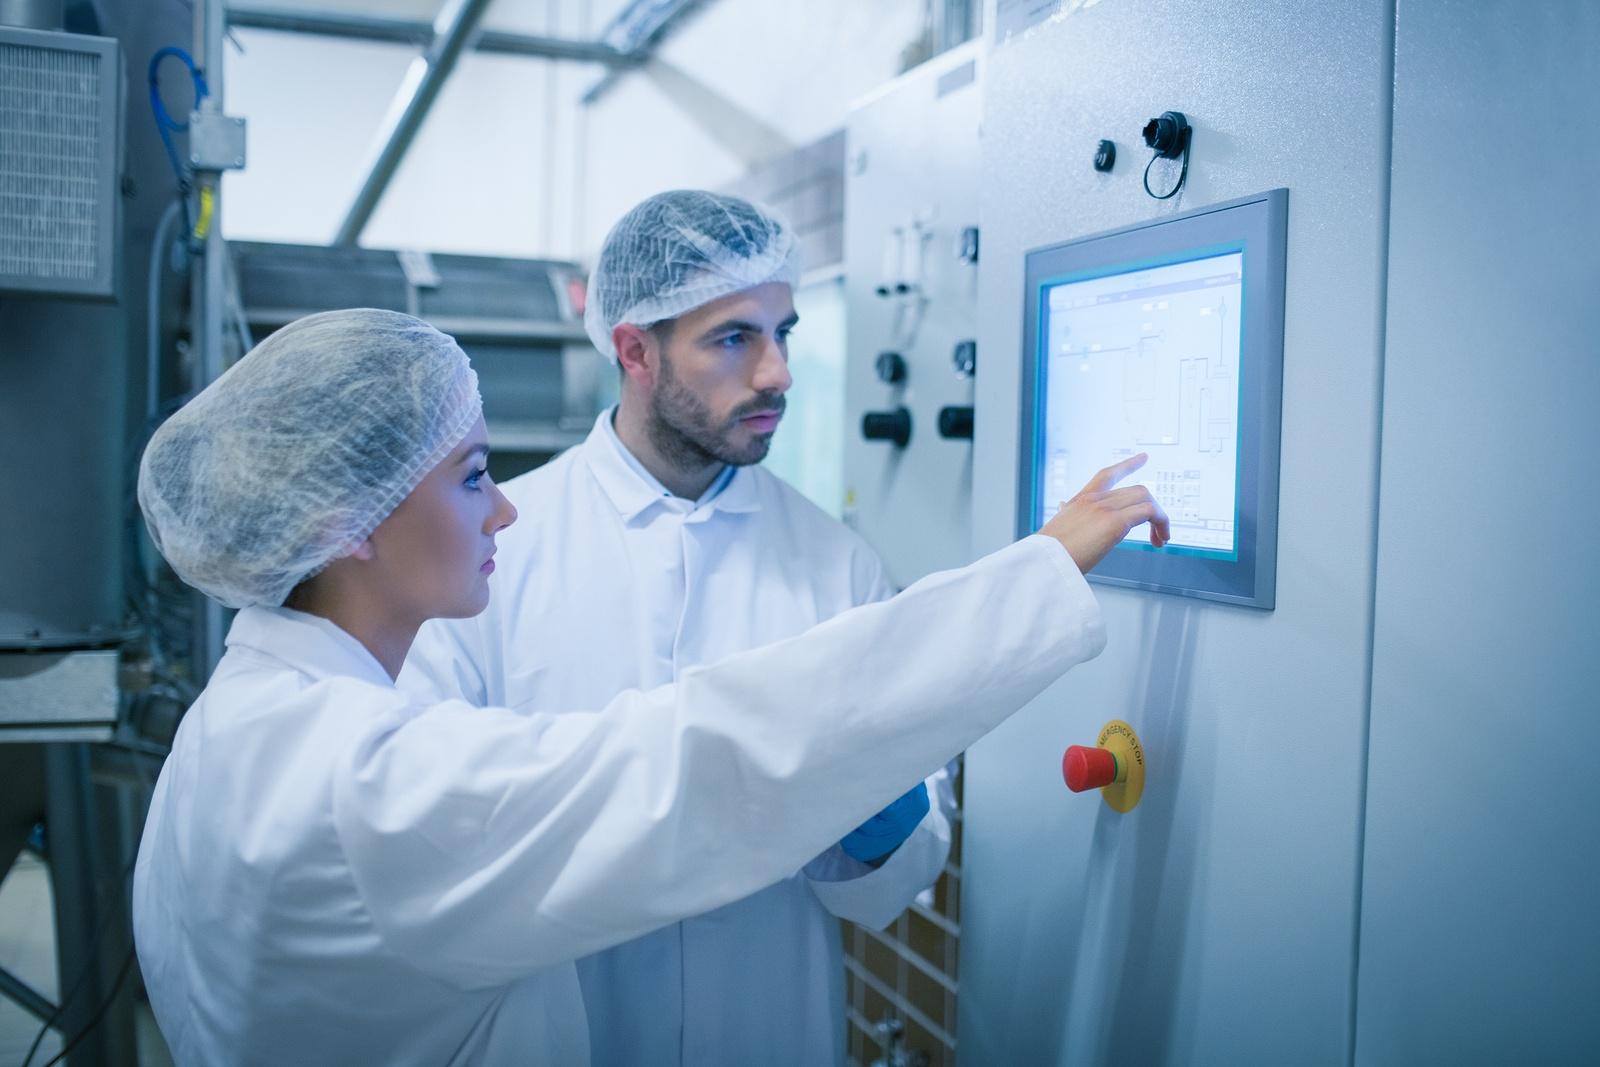 bigstock-Food-technicians-working-toget-80075318